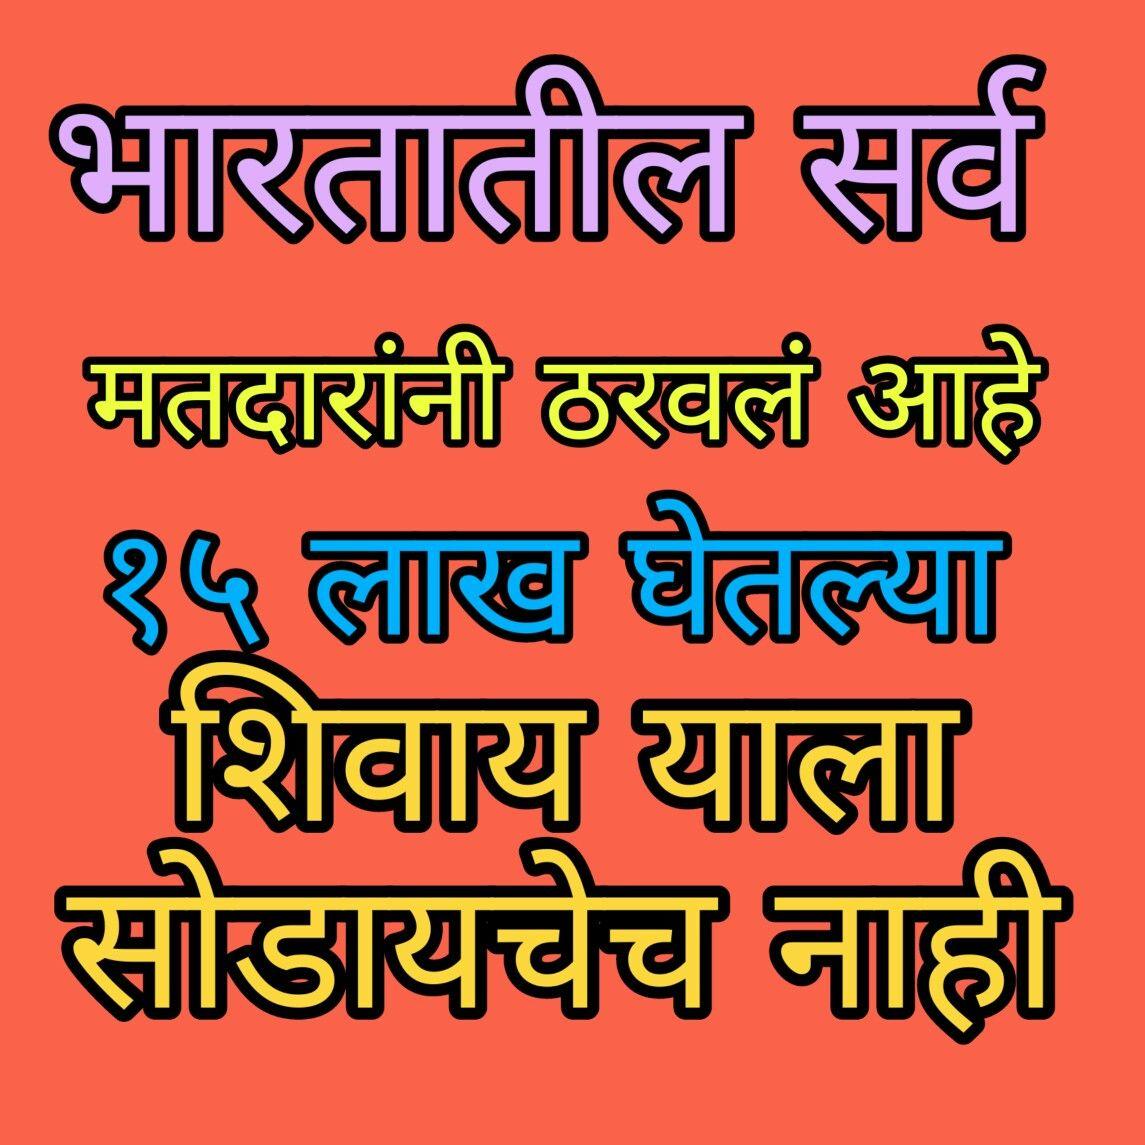 Pin by appa jadhav on Marathi festival Quotes Festival